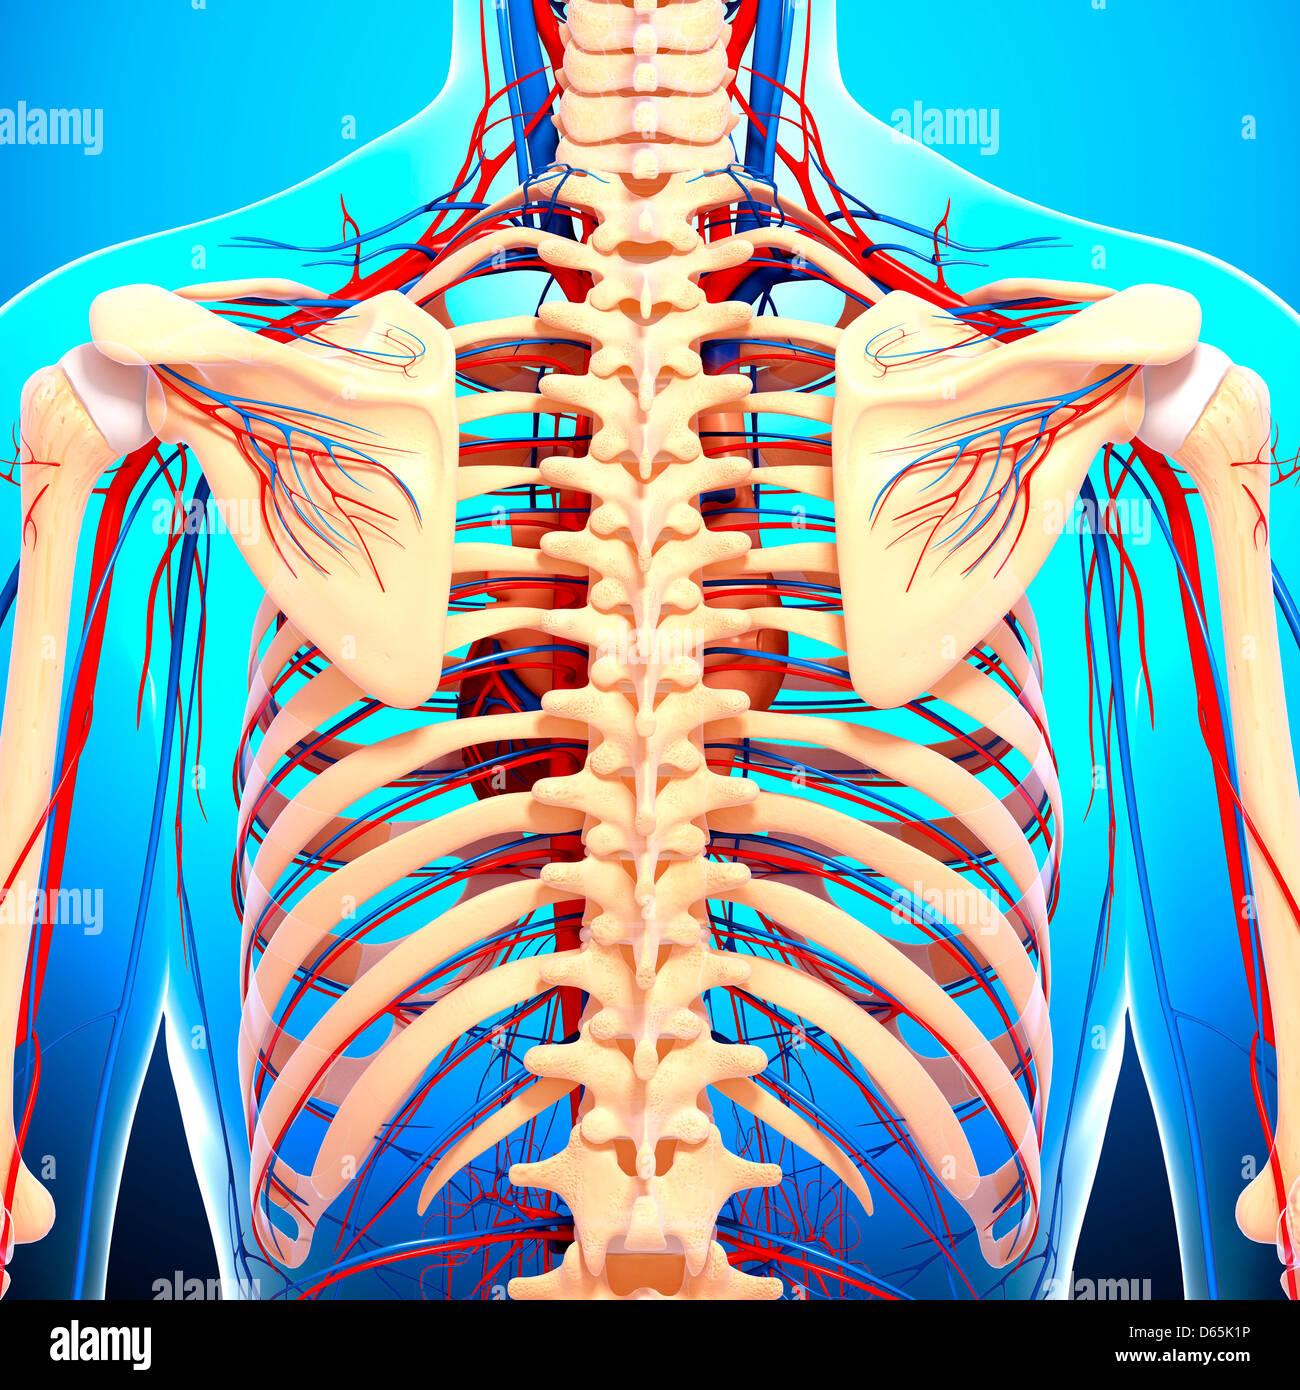 Hinteren Anatomie, artwork Stockbild